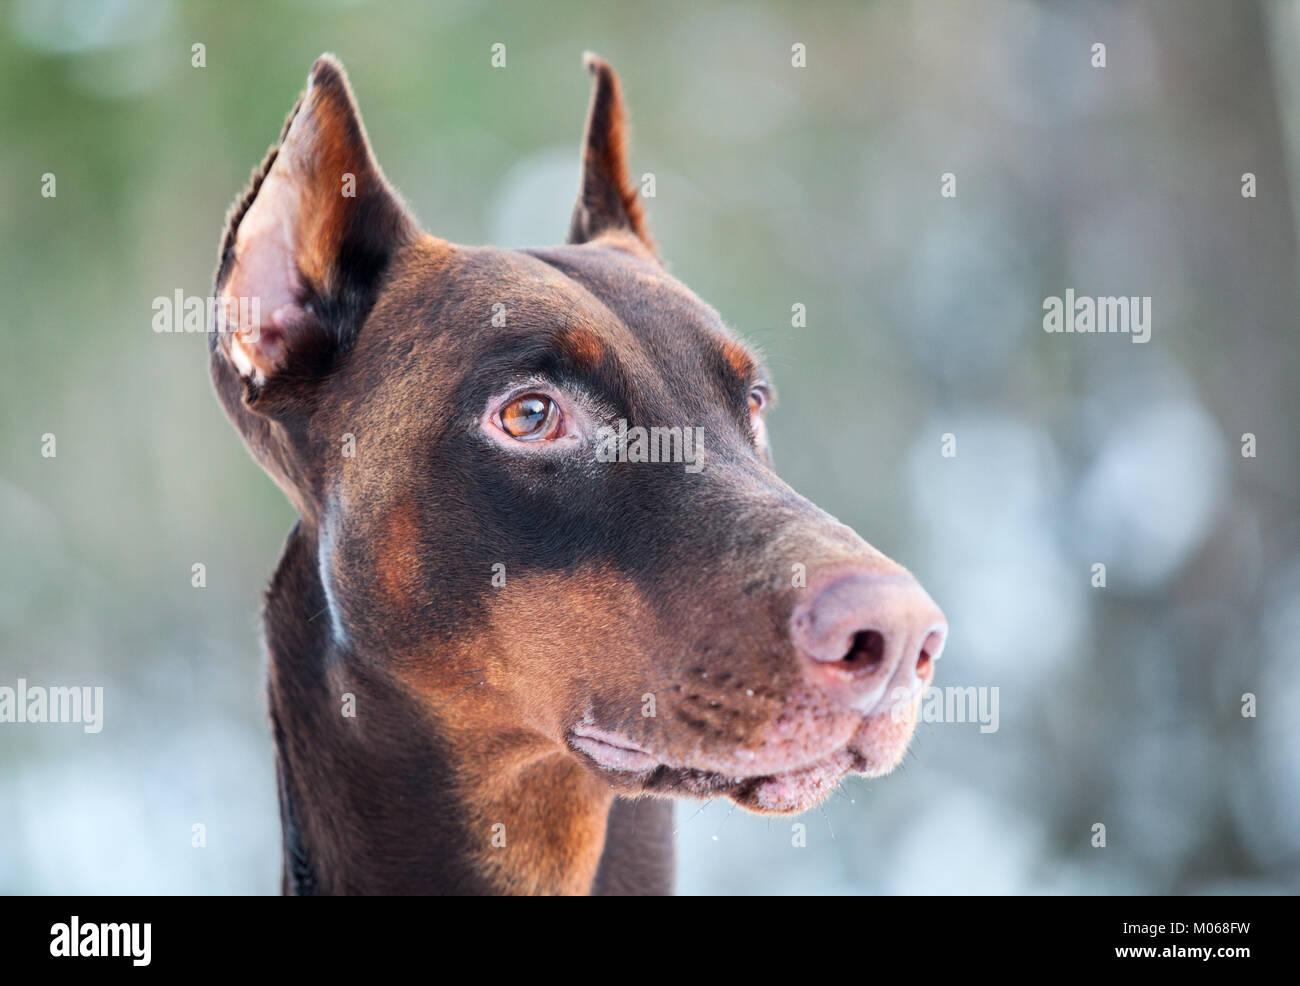 Close-up of brown Dobermann dog head - Stock Image